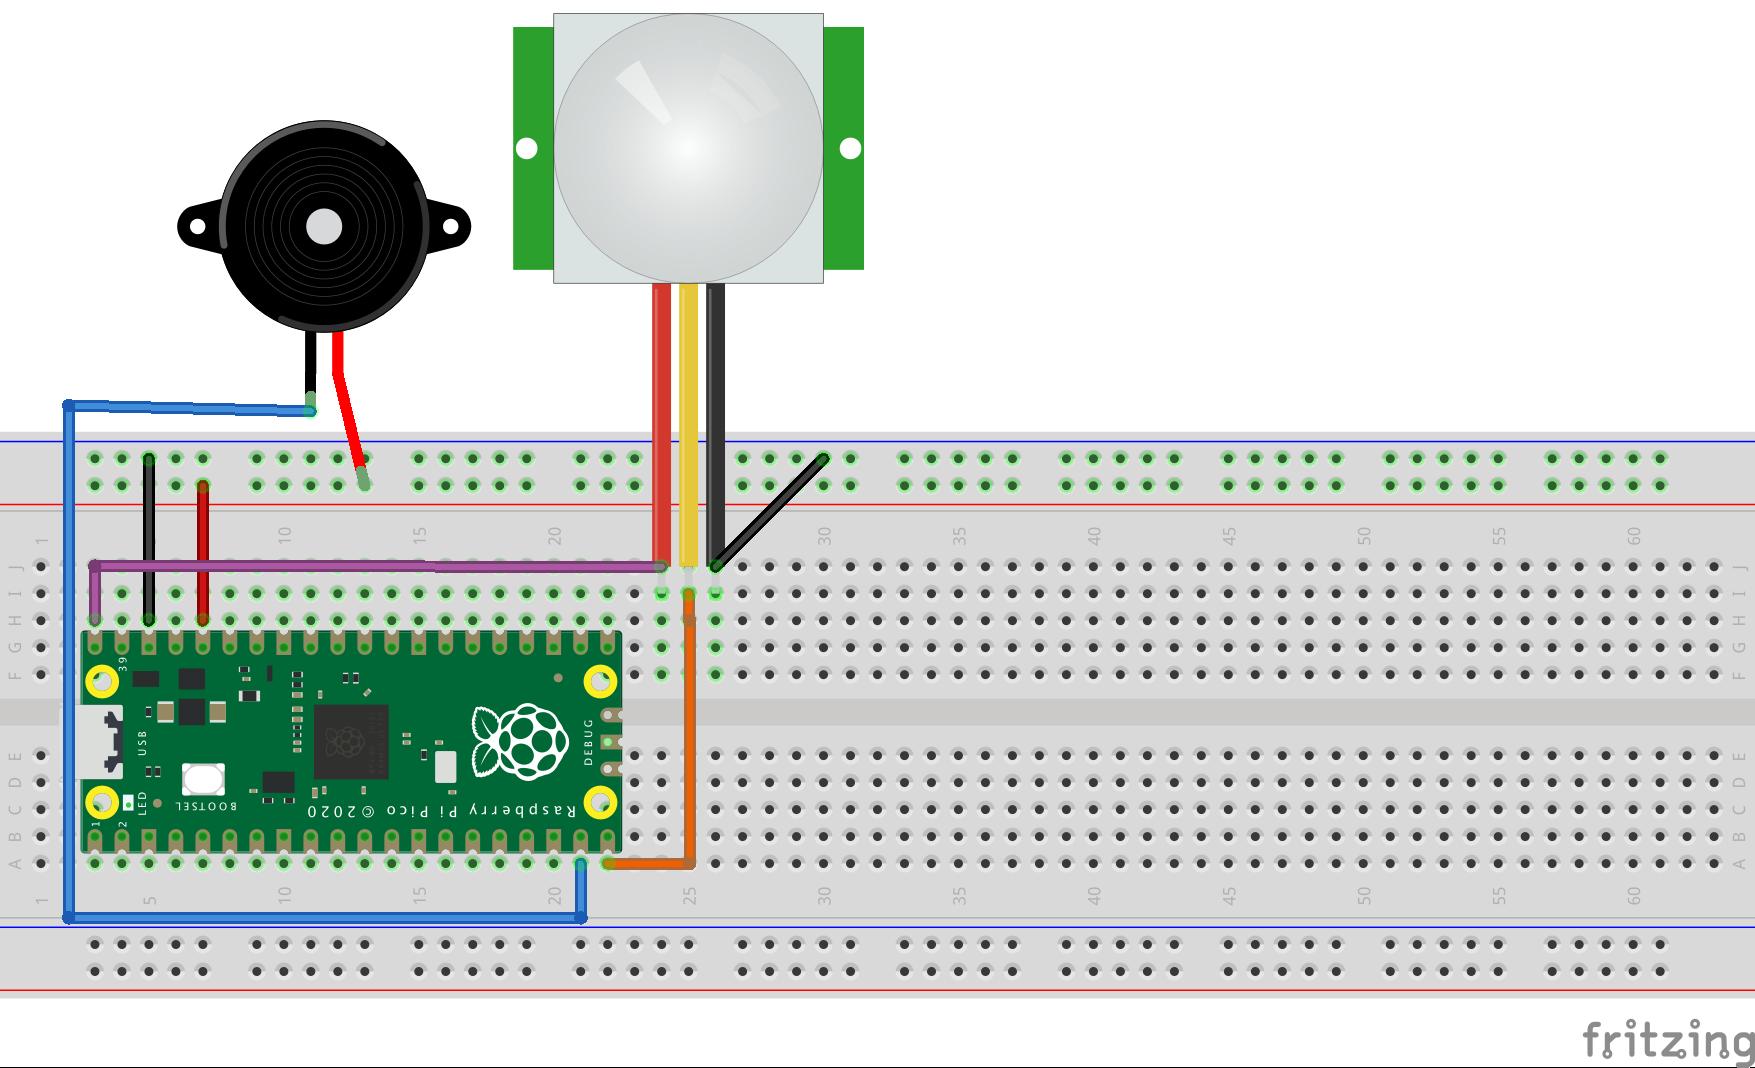 Pico Graphic Programming Lesson 5: Intruder Alarm System